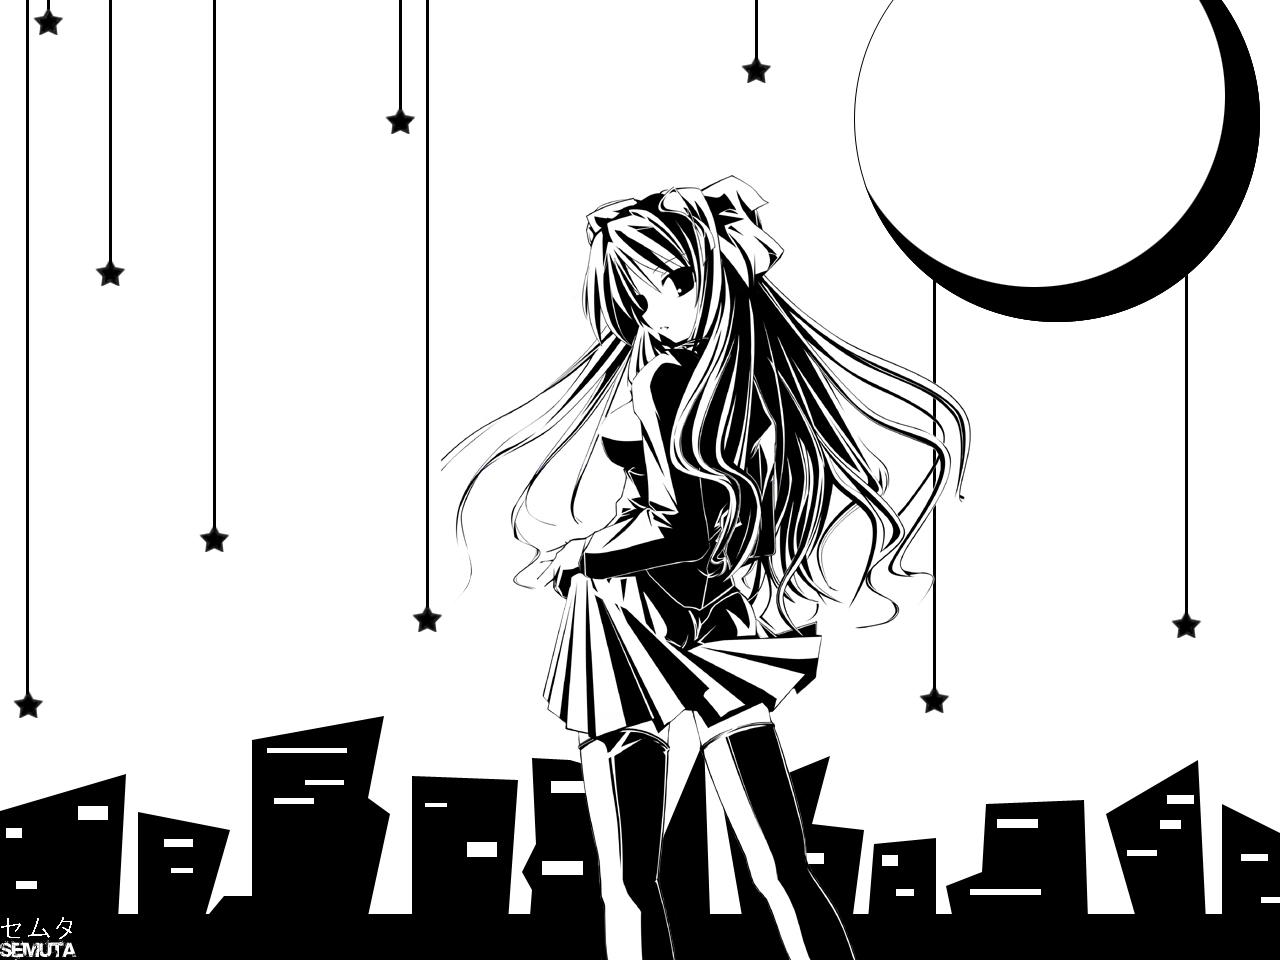 Minitokyo_Fate-Stay_Night_Wallpapers_213973.jpg